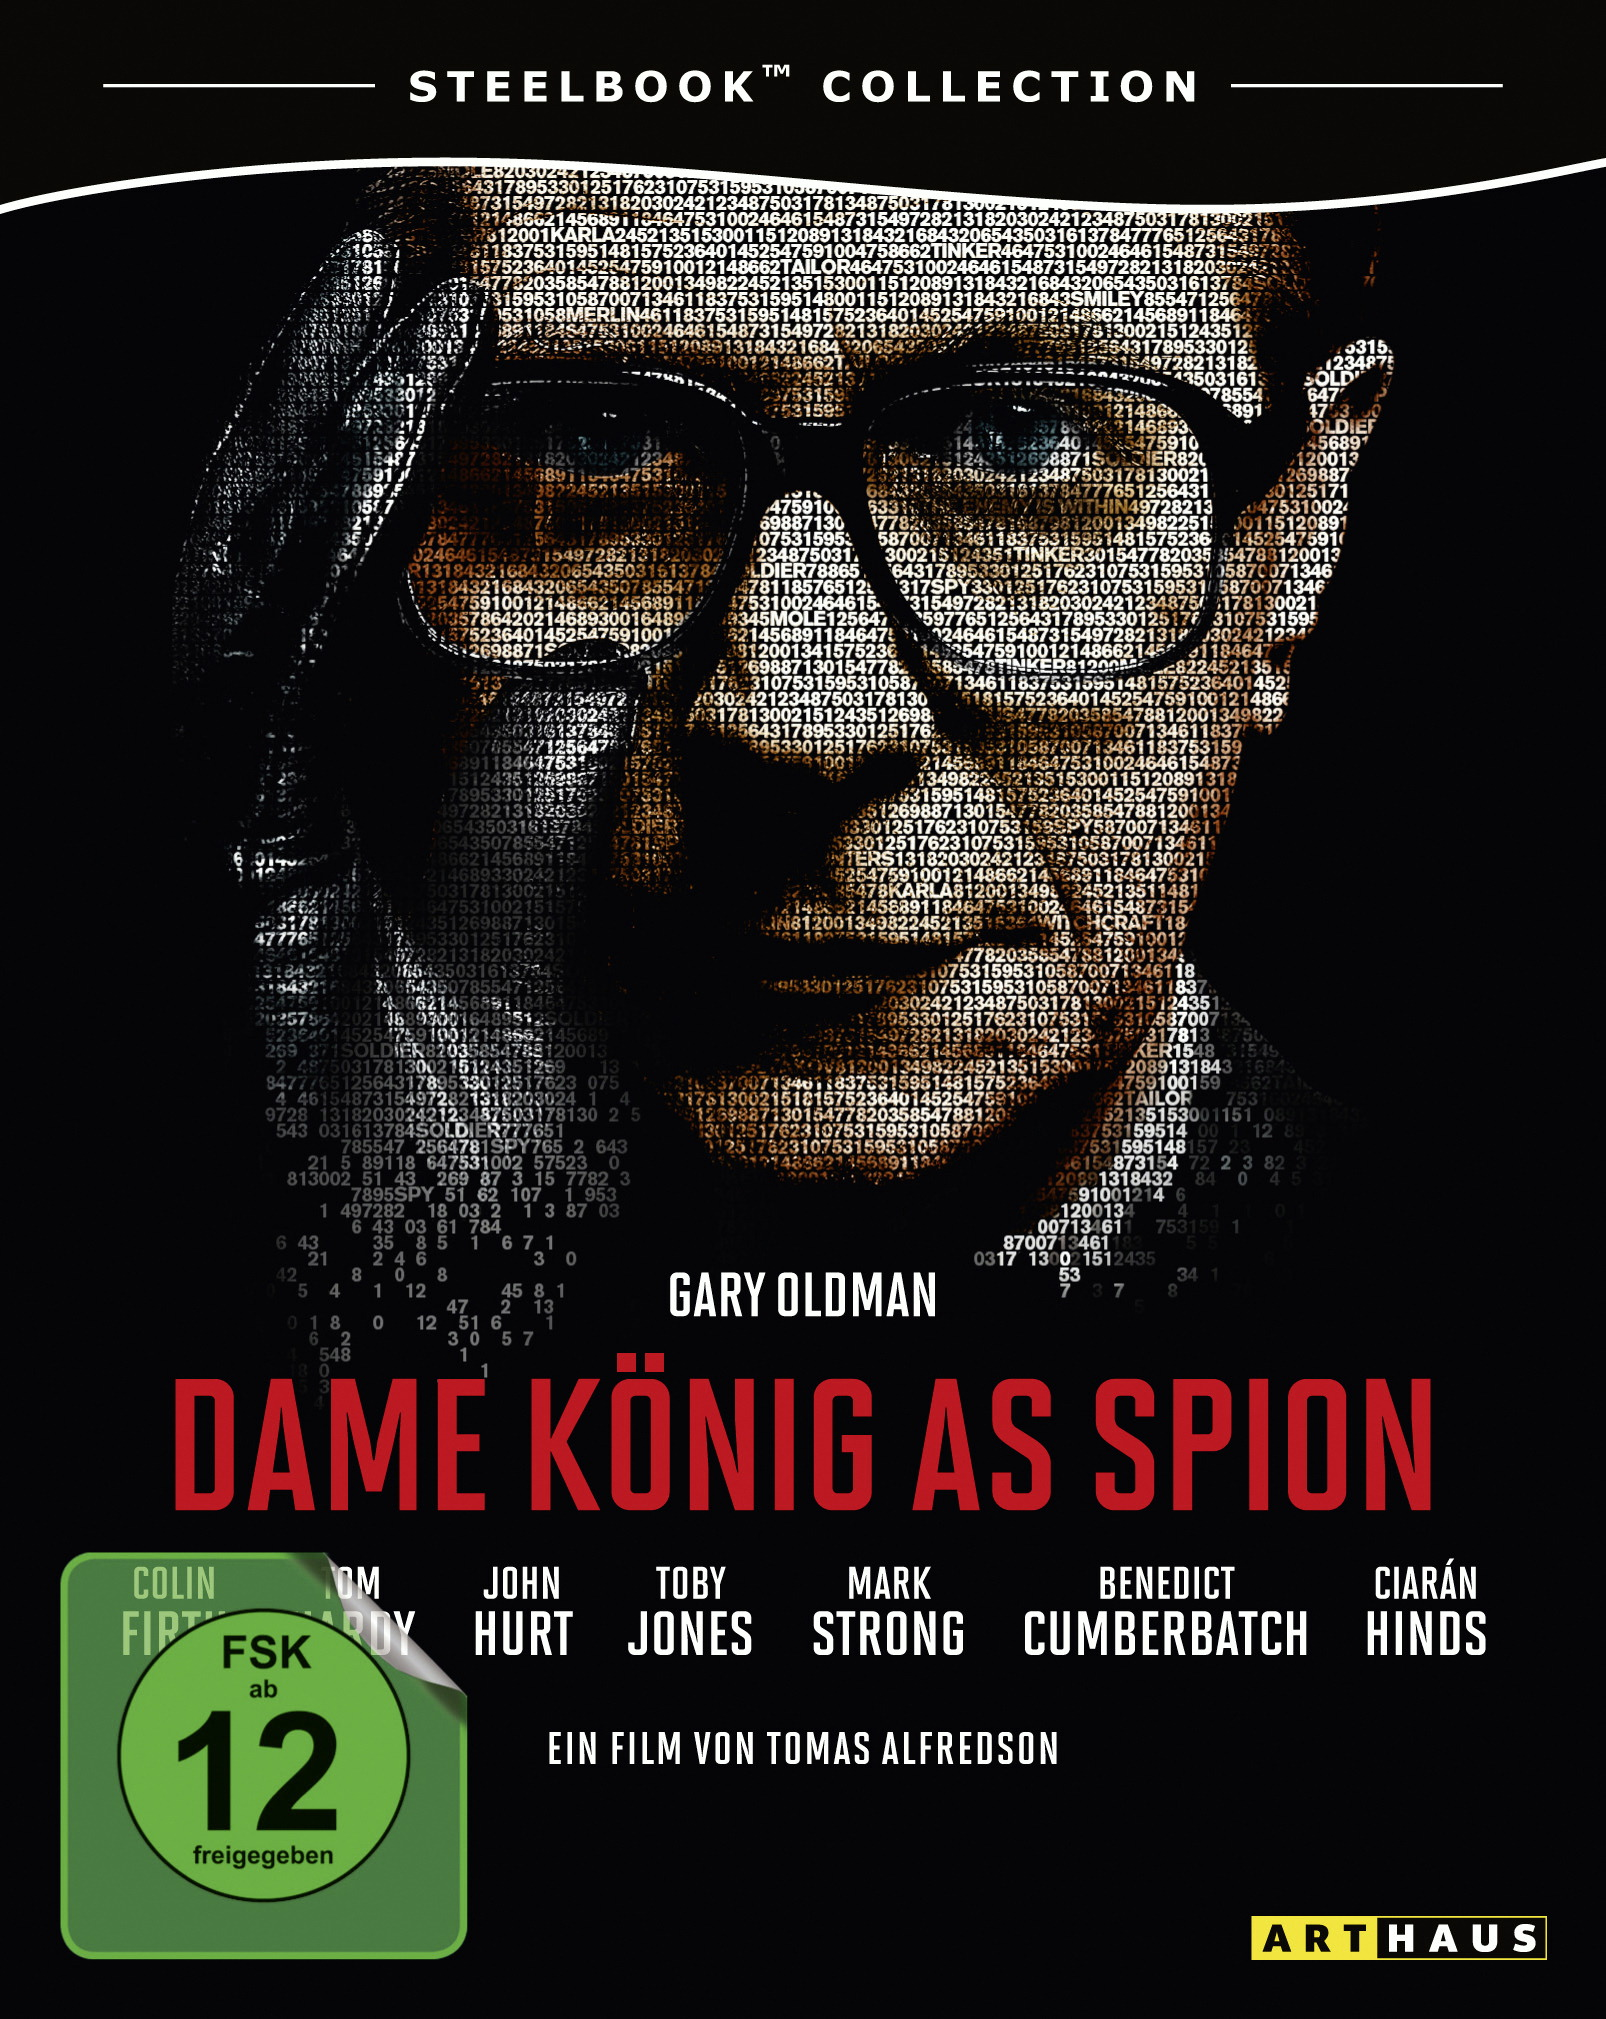 Dame König As Spion (Steelbook Collection) Poster